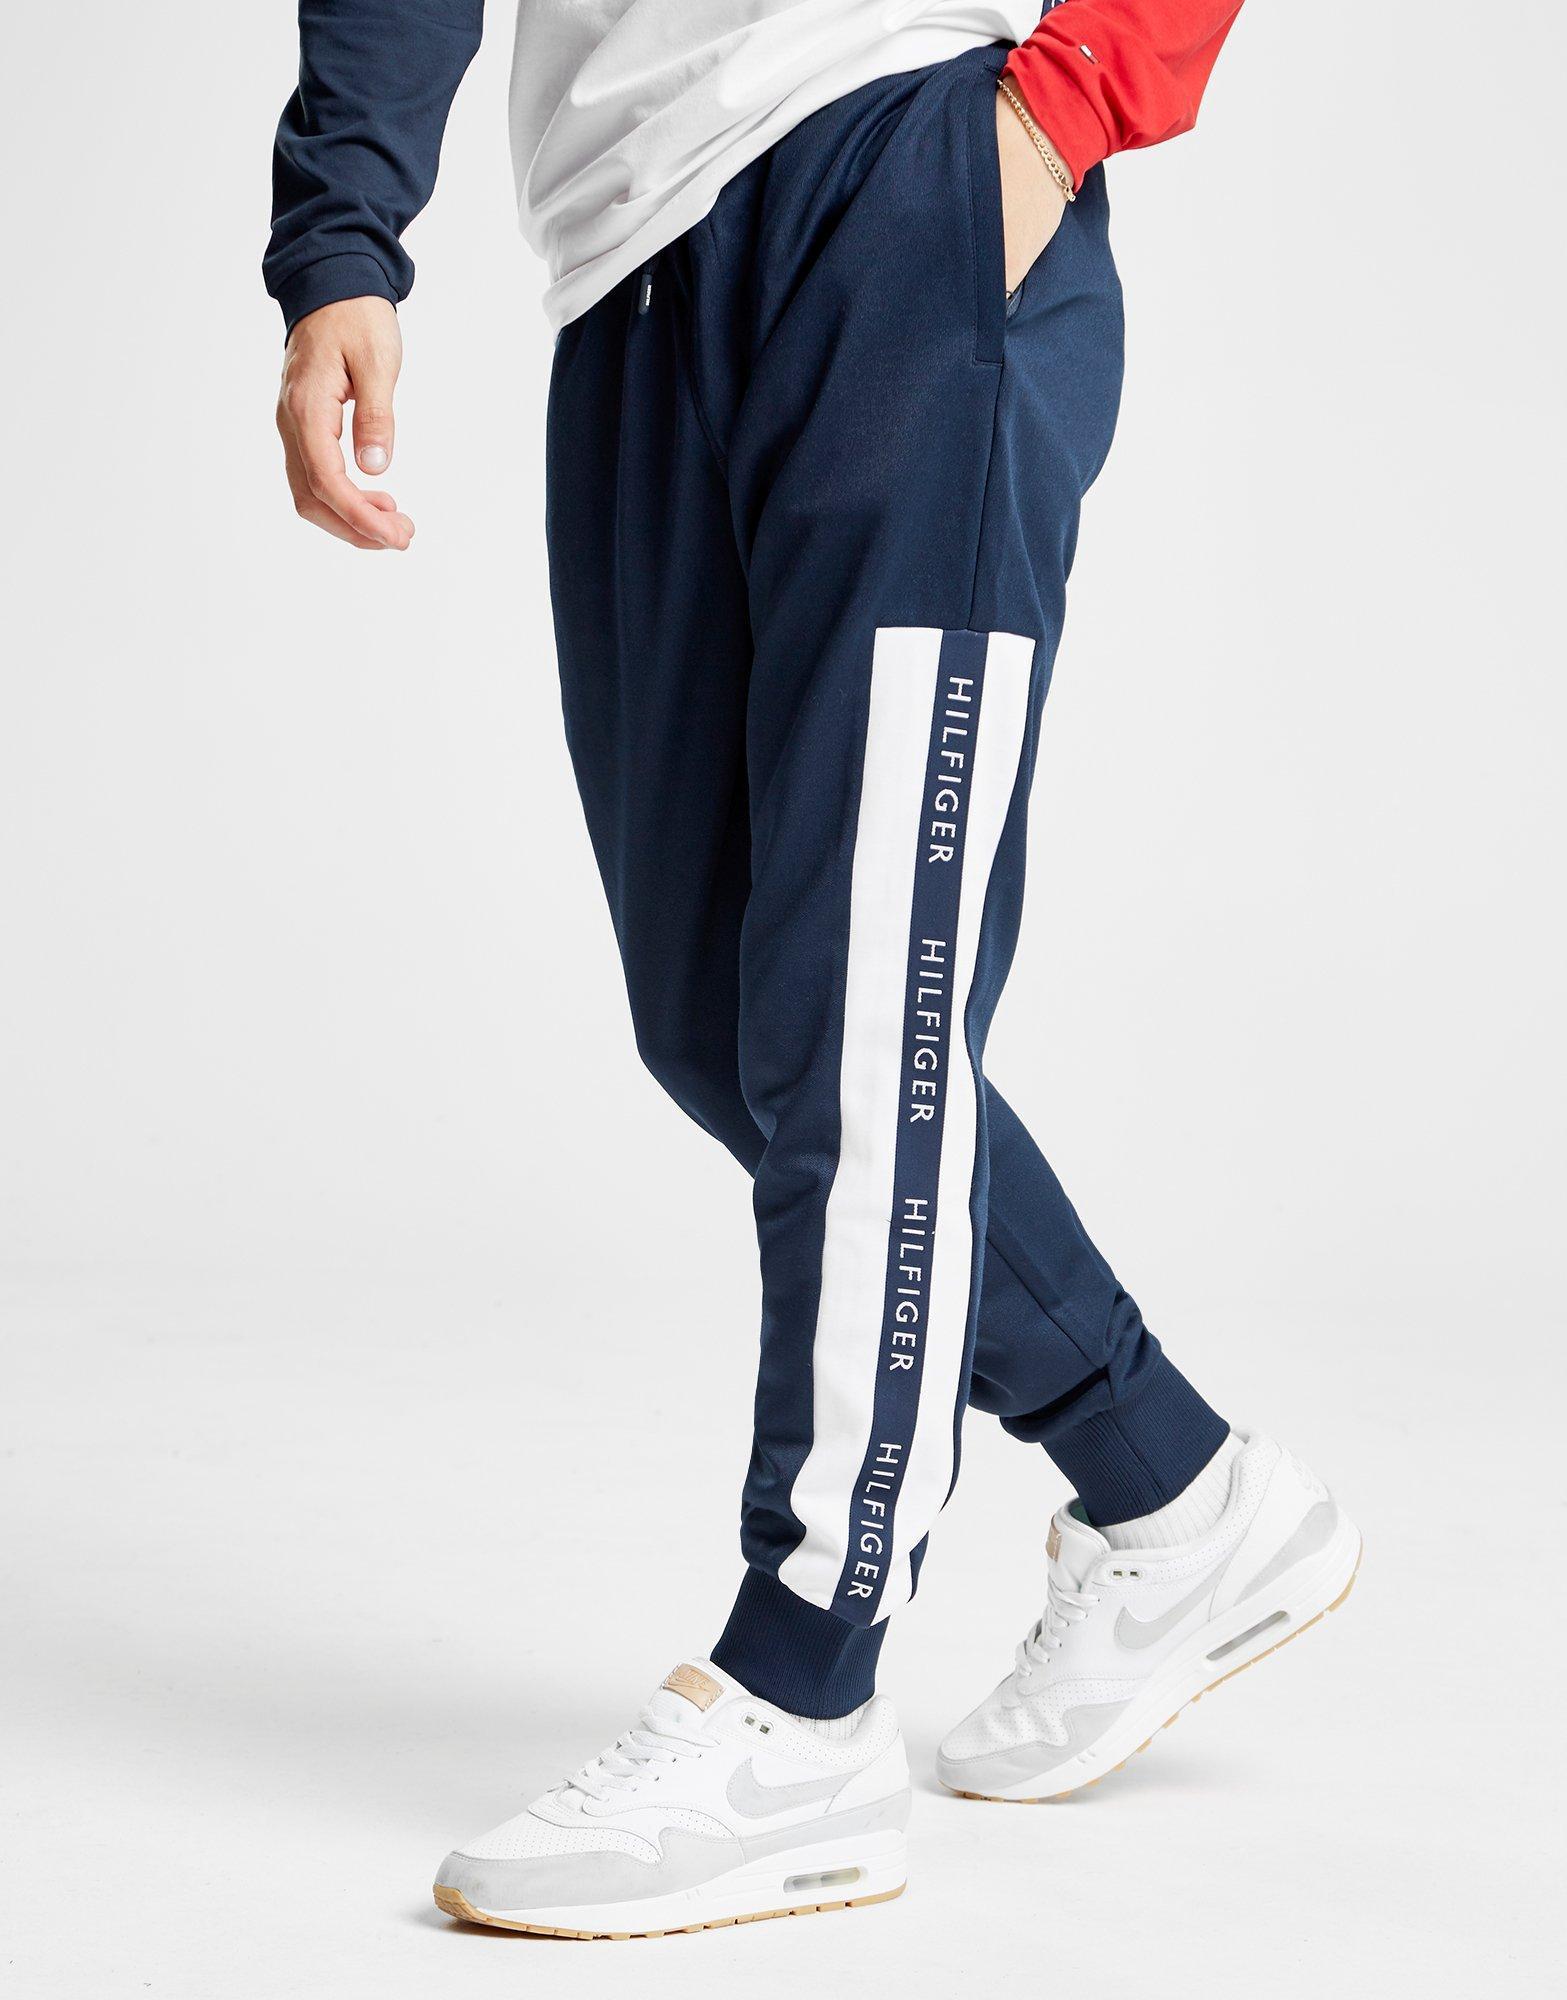 Blue Tommy Hilfiger Men/'s Pull-on Fleece Pants